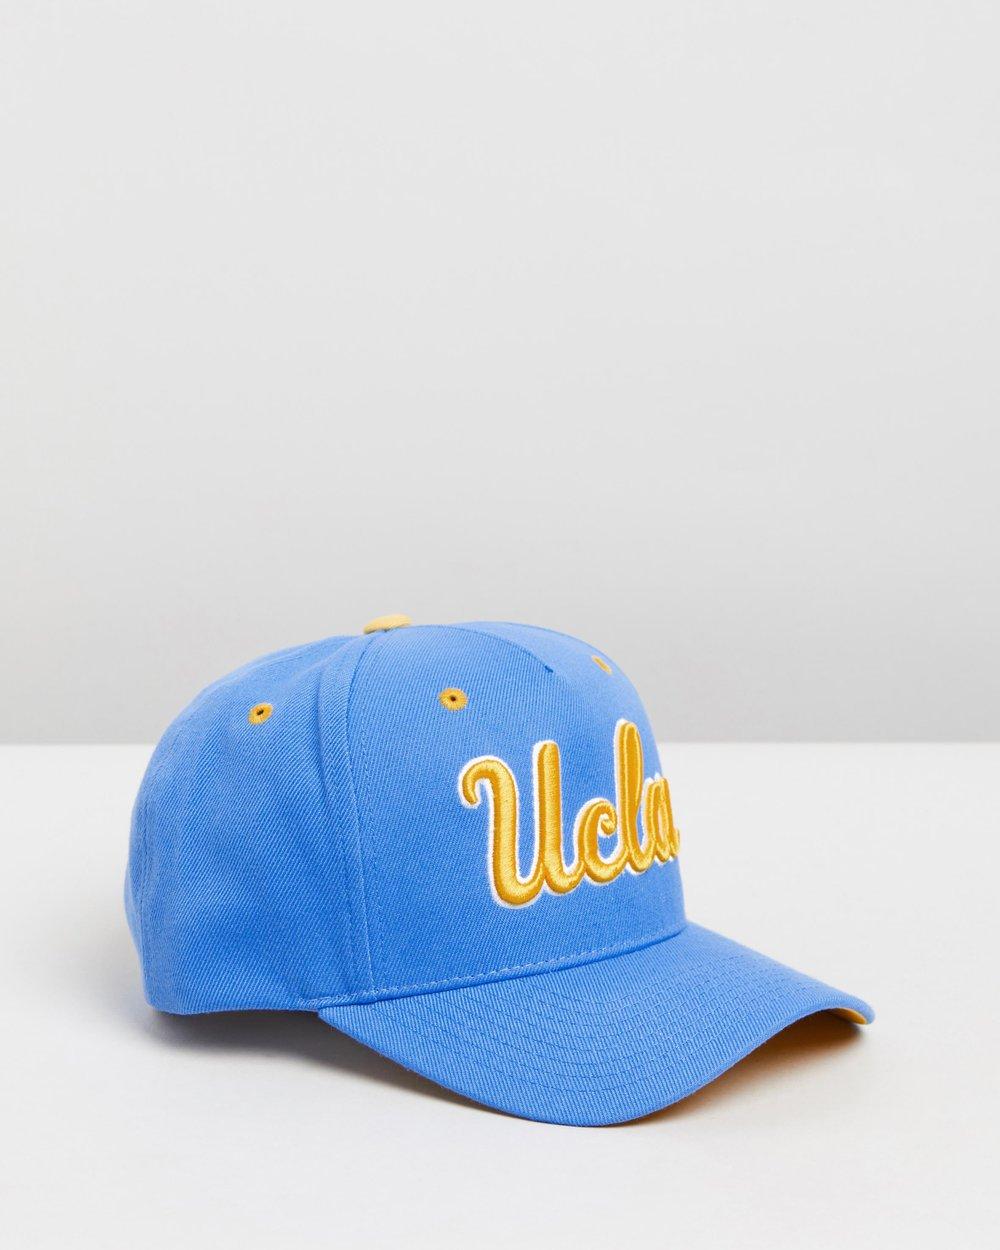 UCLA Snapback